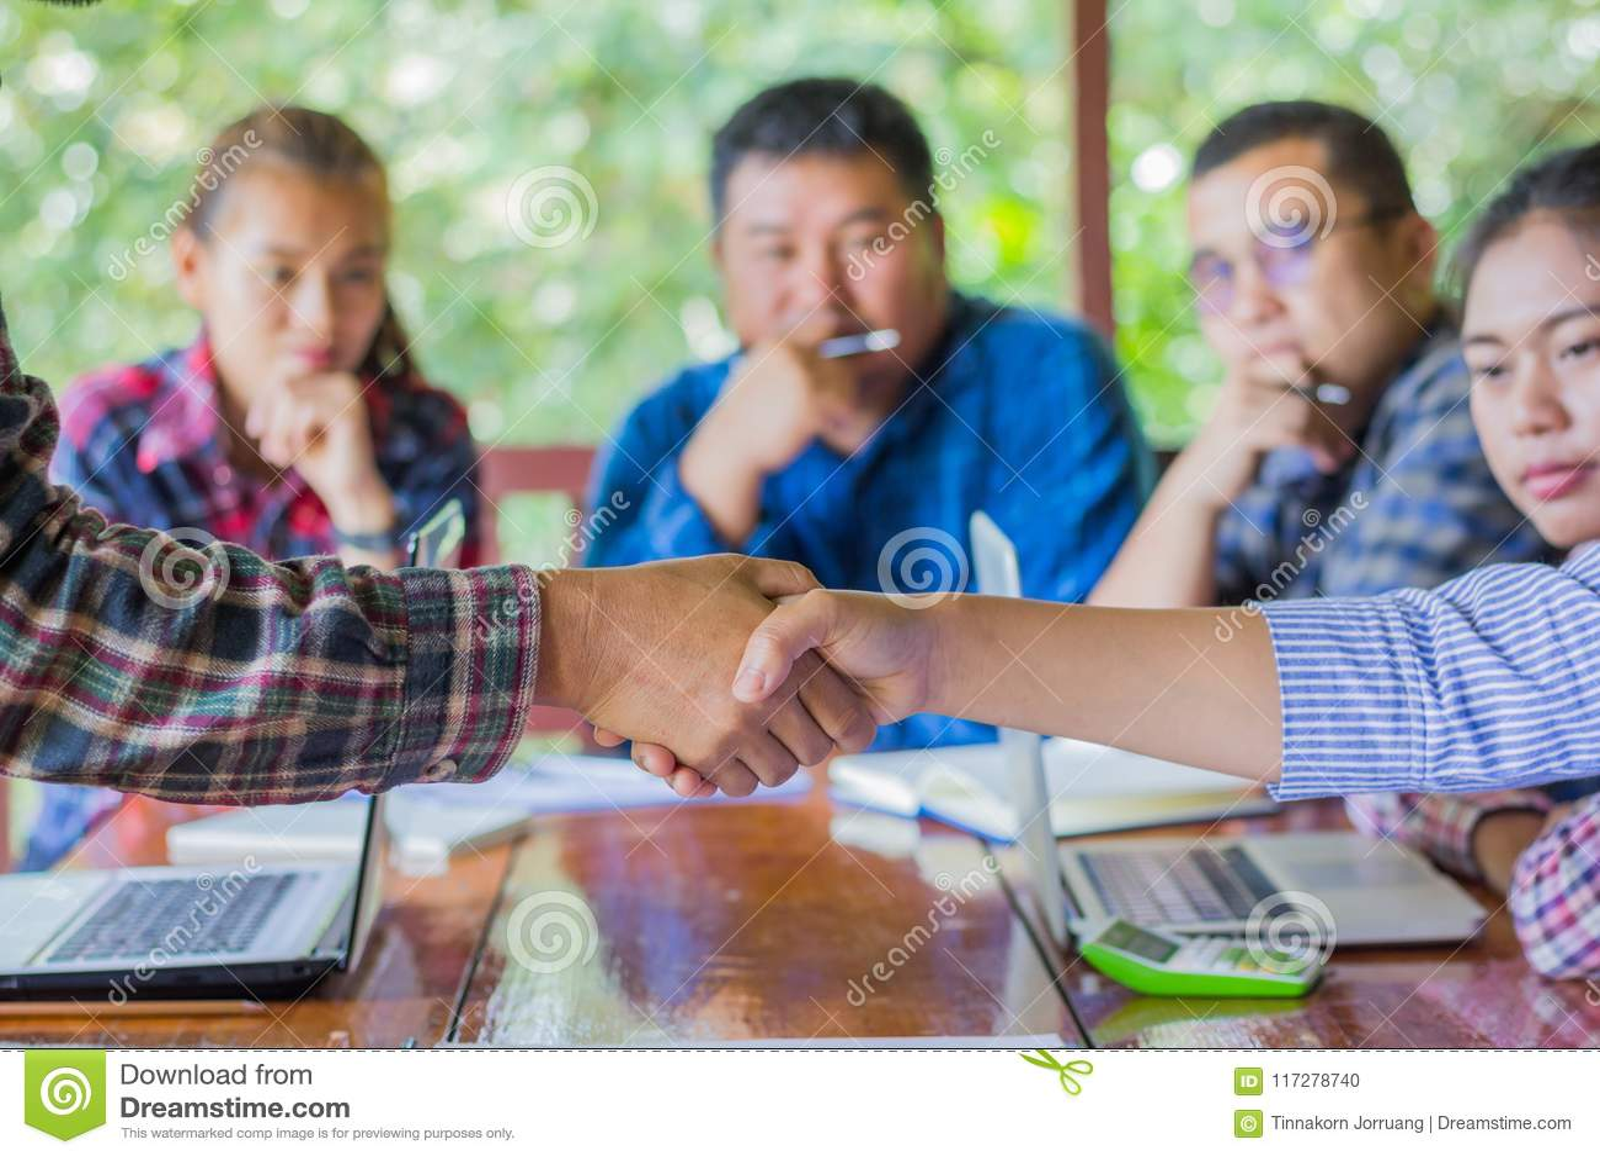 Bedrijfsmensen die handen, Bedrijfssamenwerkingsconcepten schudden,